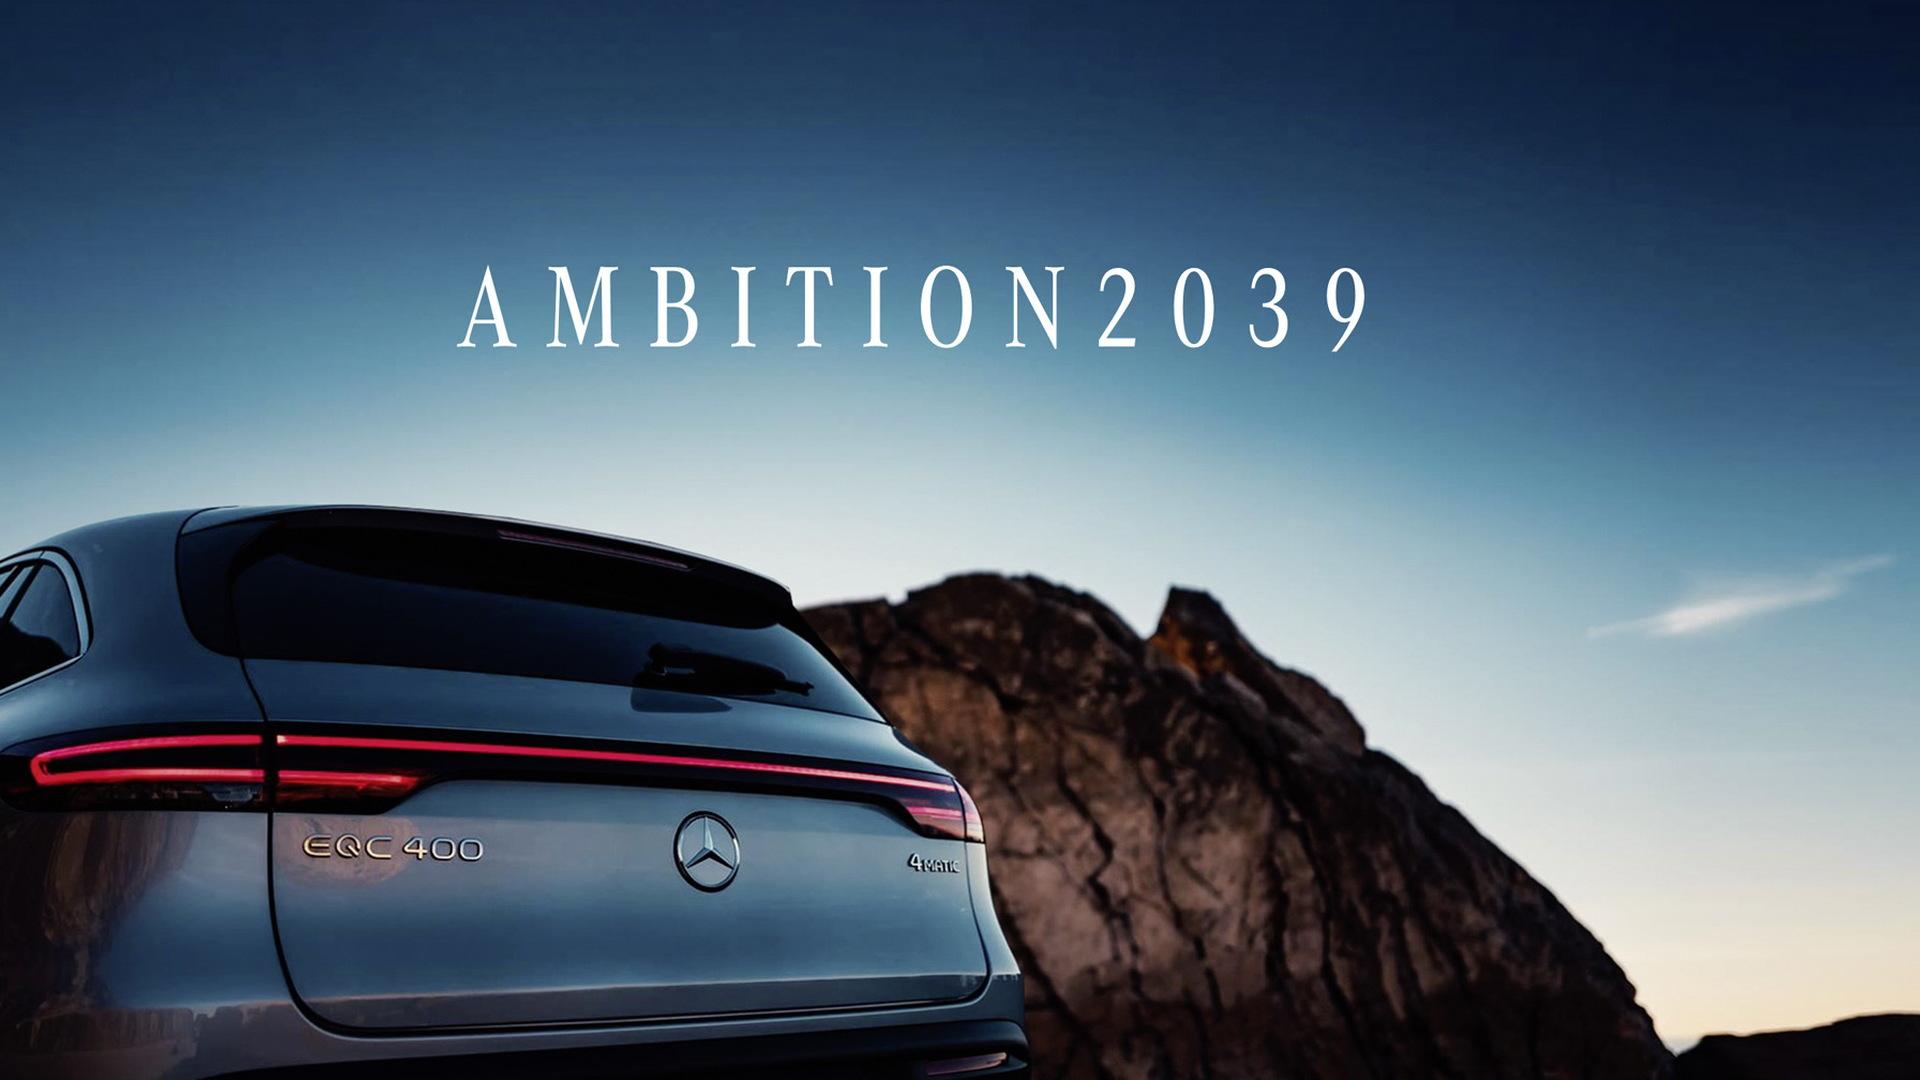 Mercedes-Benz Ambition 2039